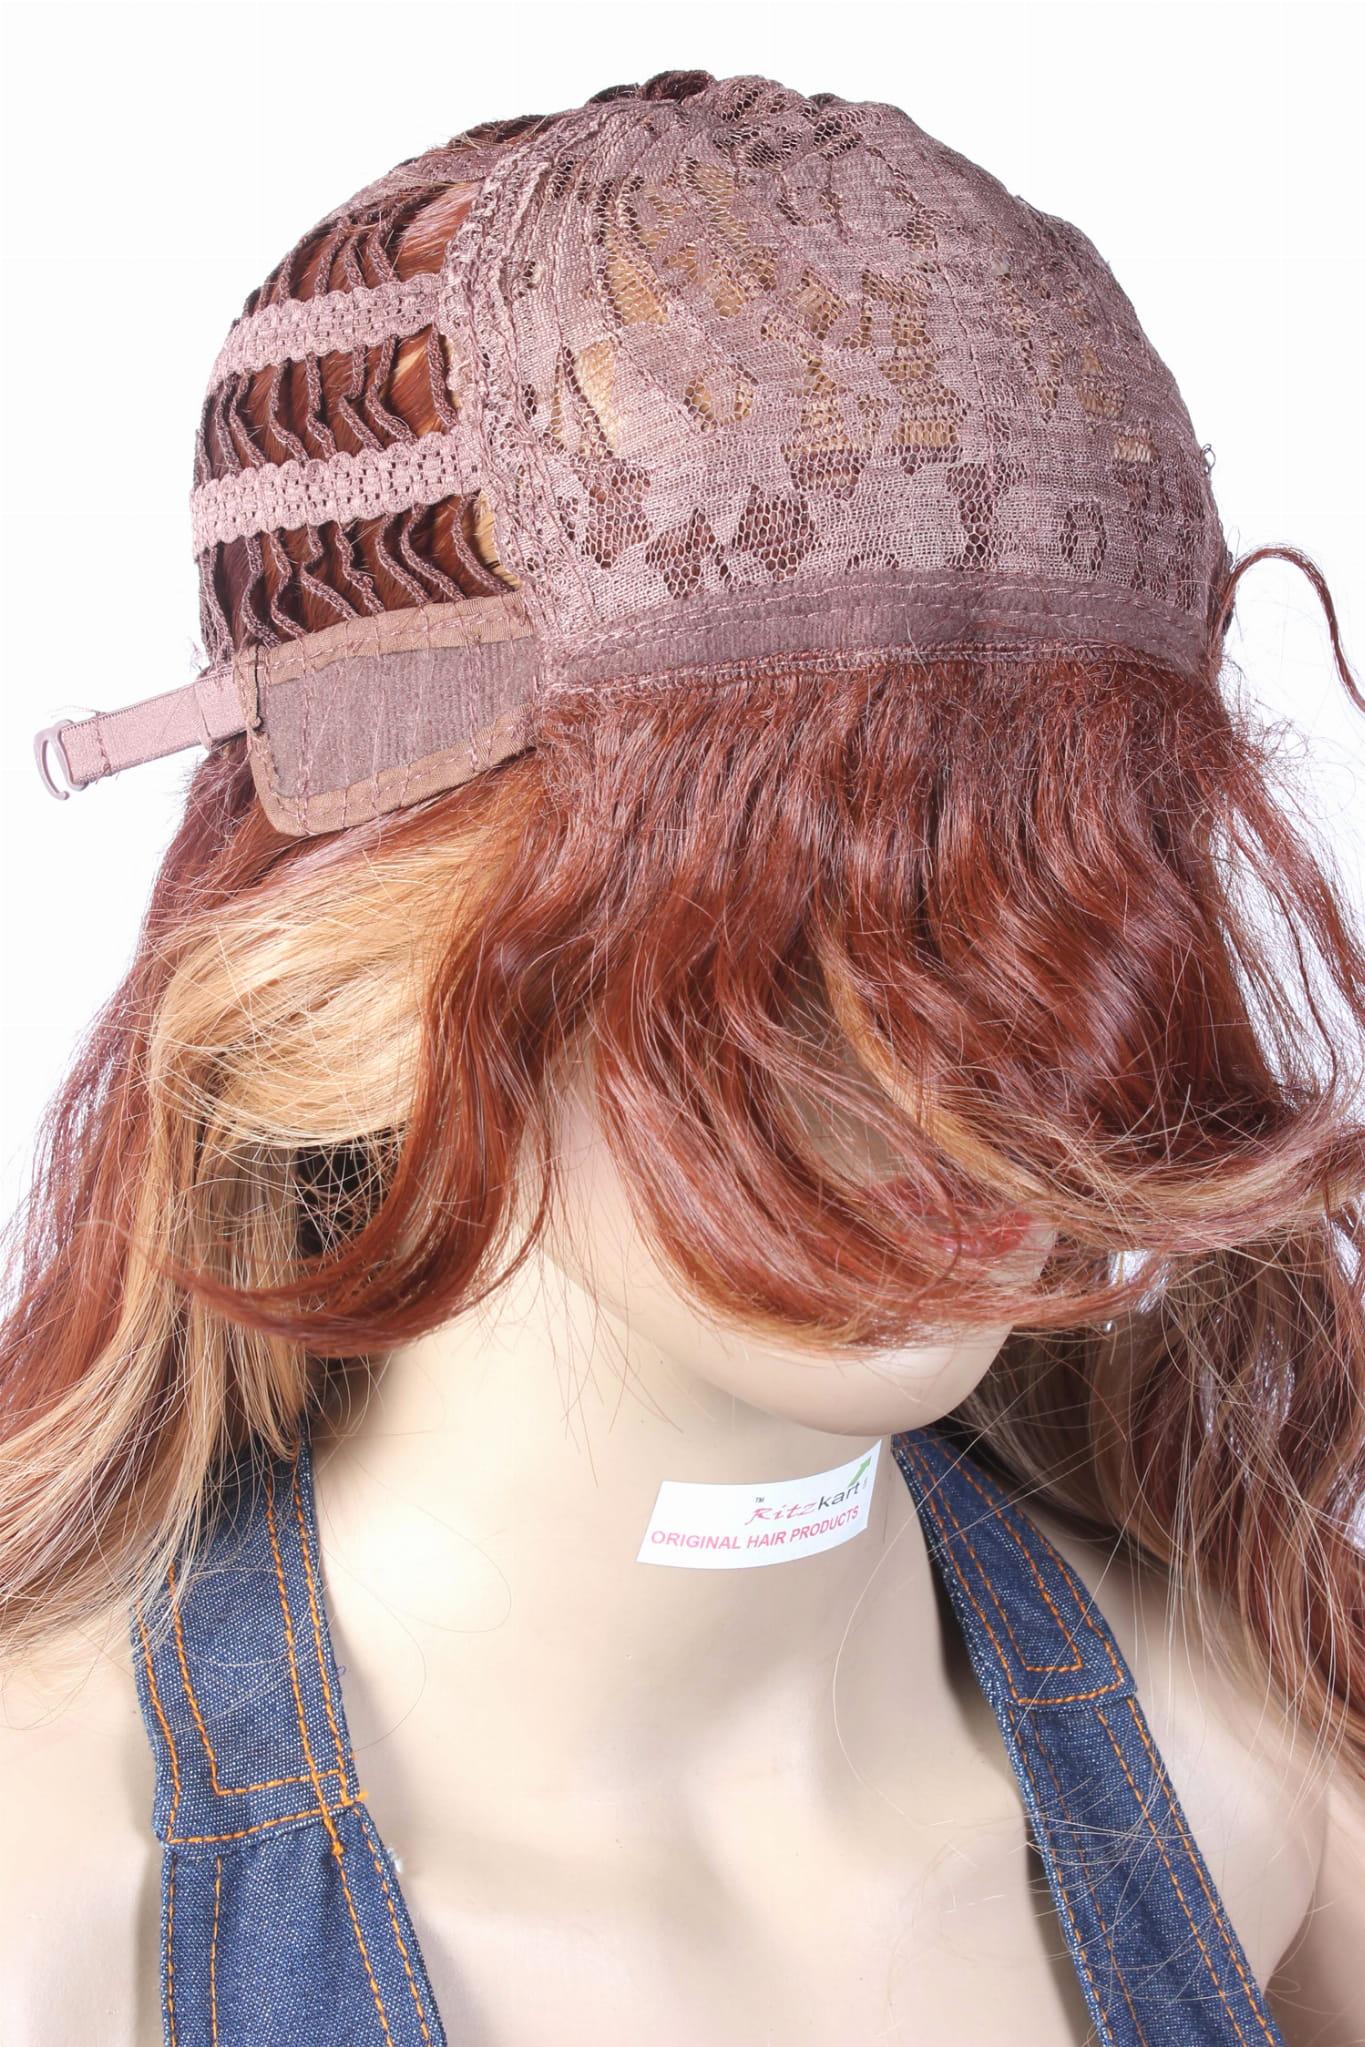 Ritzkart 30 Inch Highlight Synthetic Long Wavy Golden Brown Wig